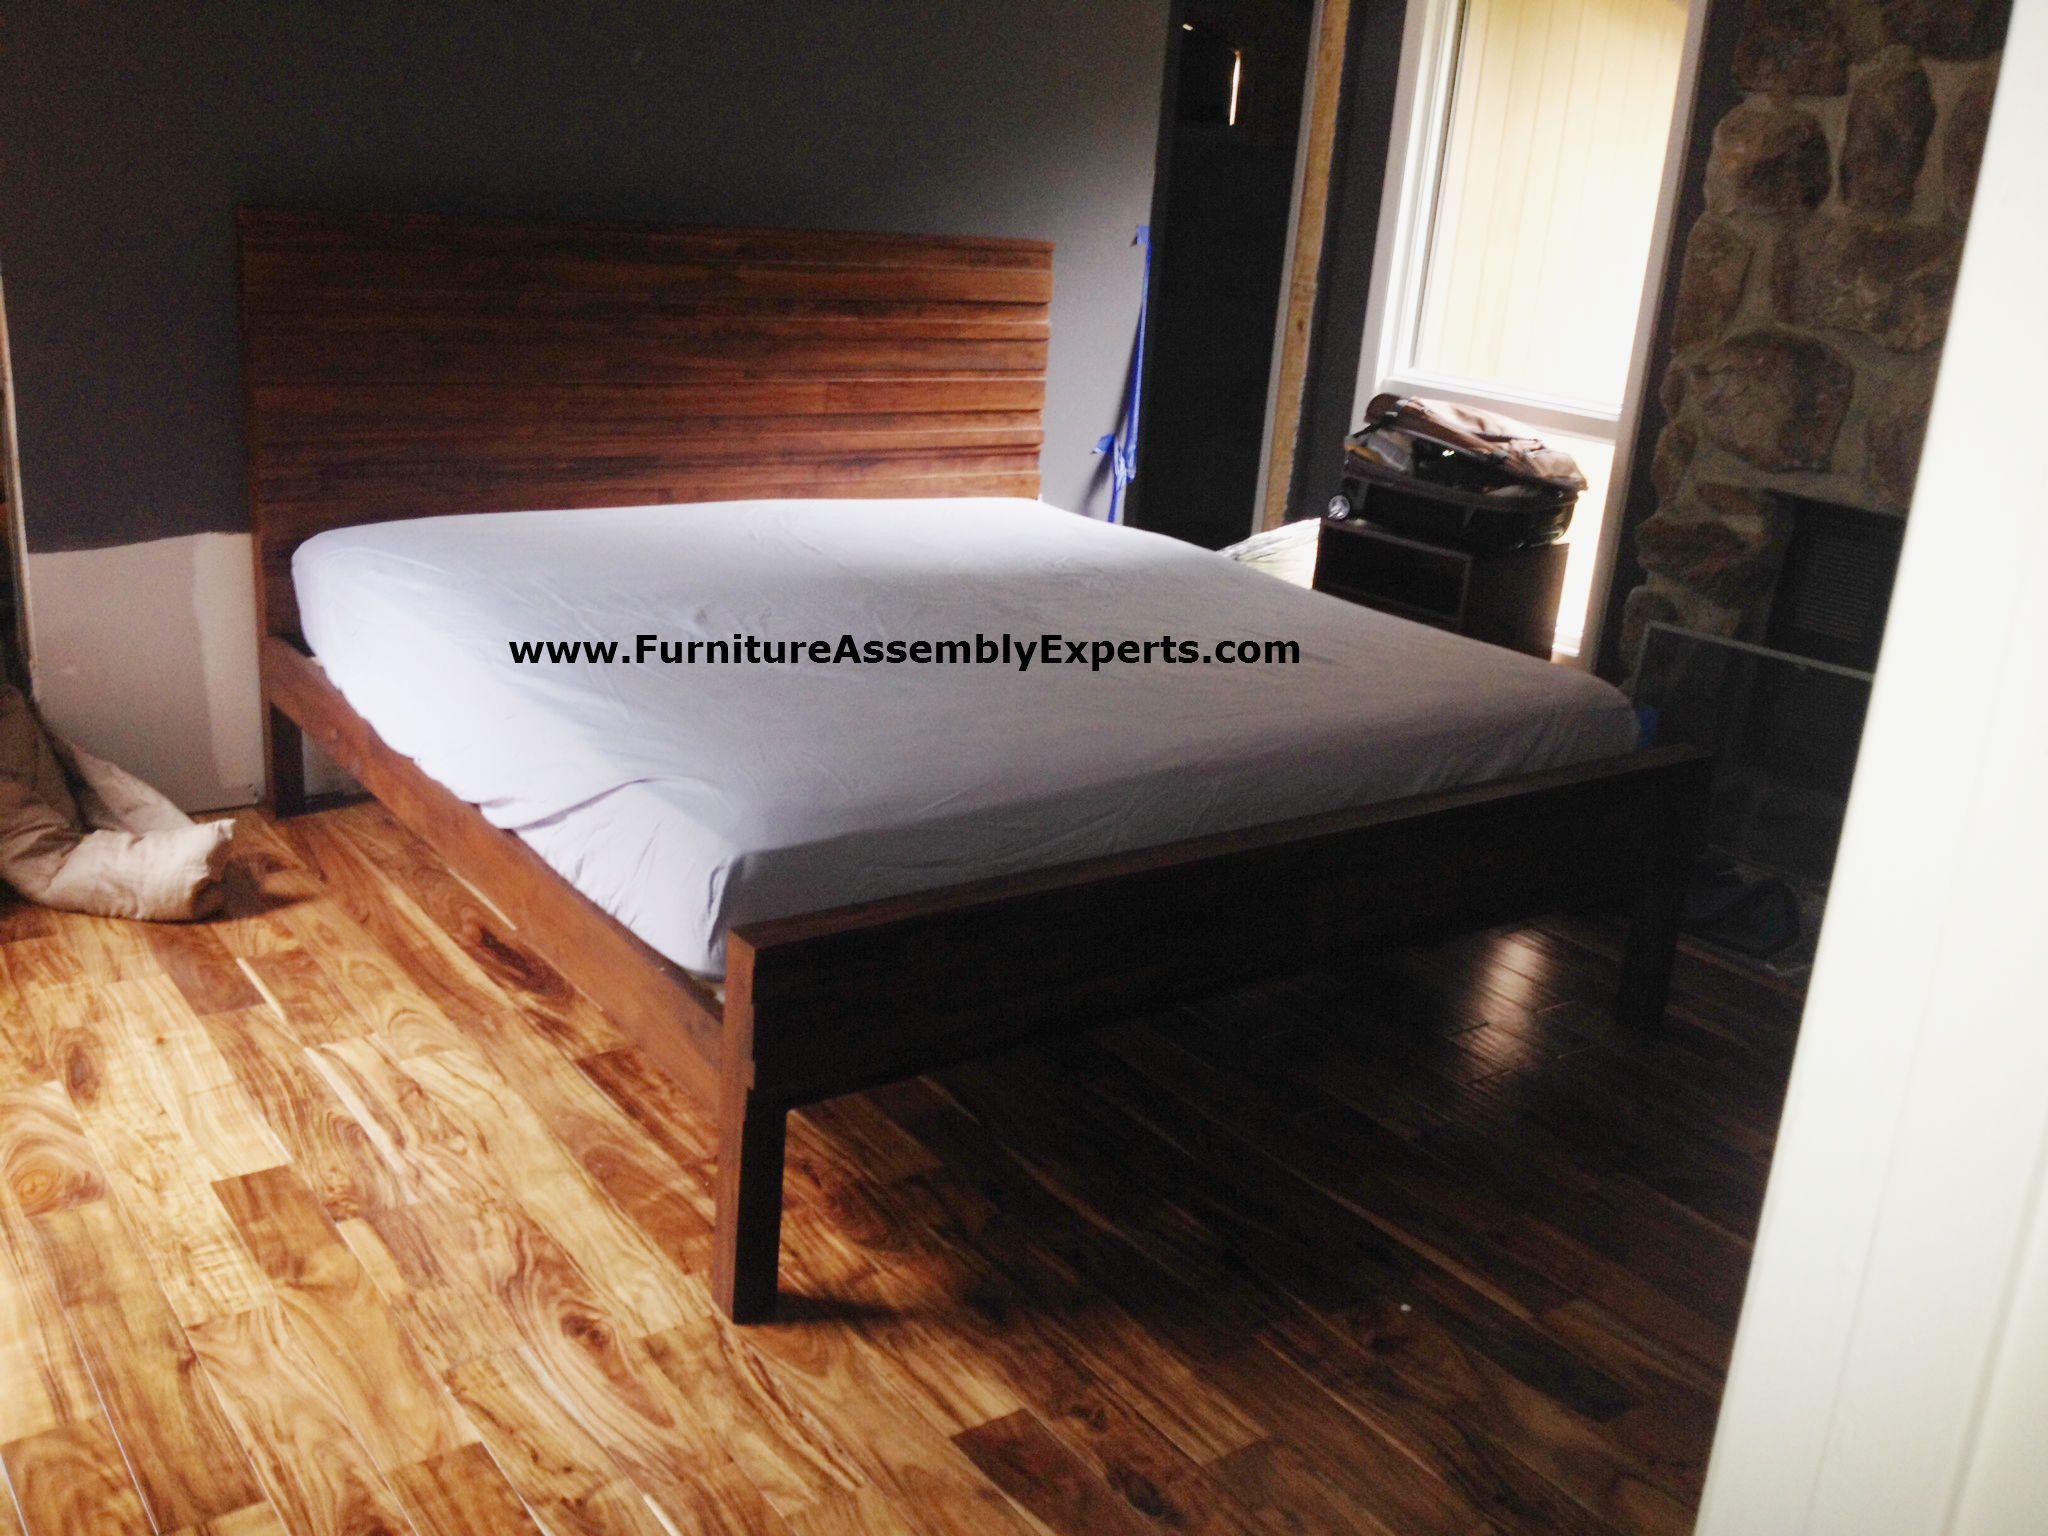 West Elm Stria Platform Bed Assembled In Bethesda MD By Furniture Assembly  Experts LLC